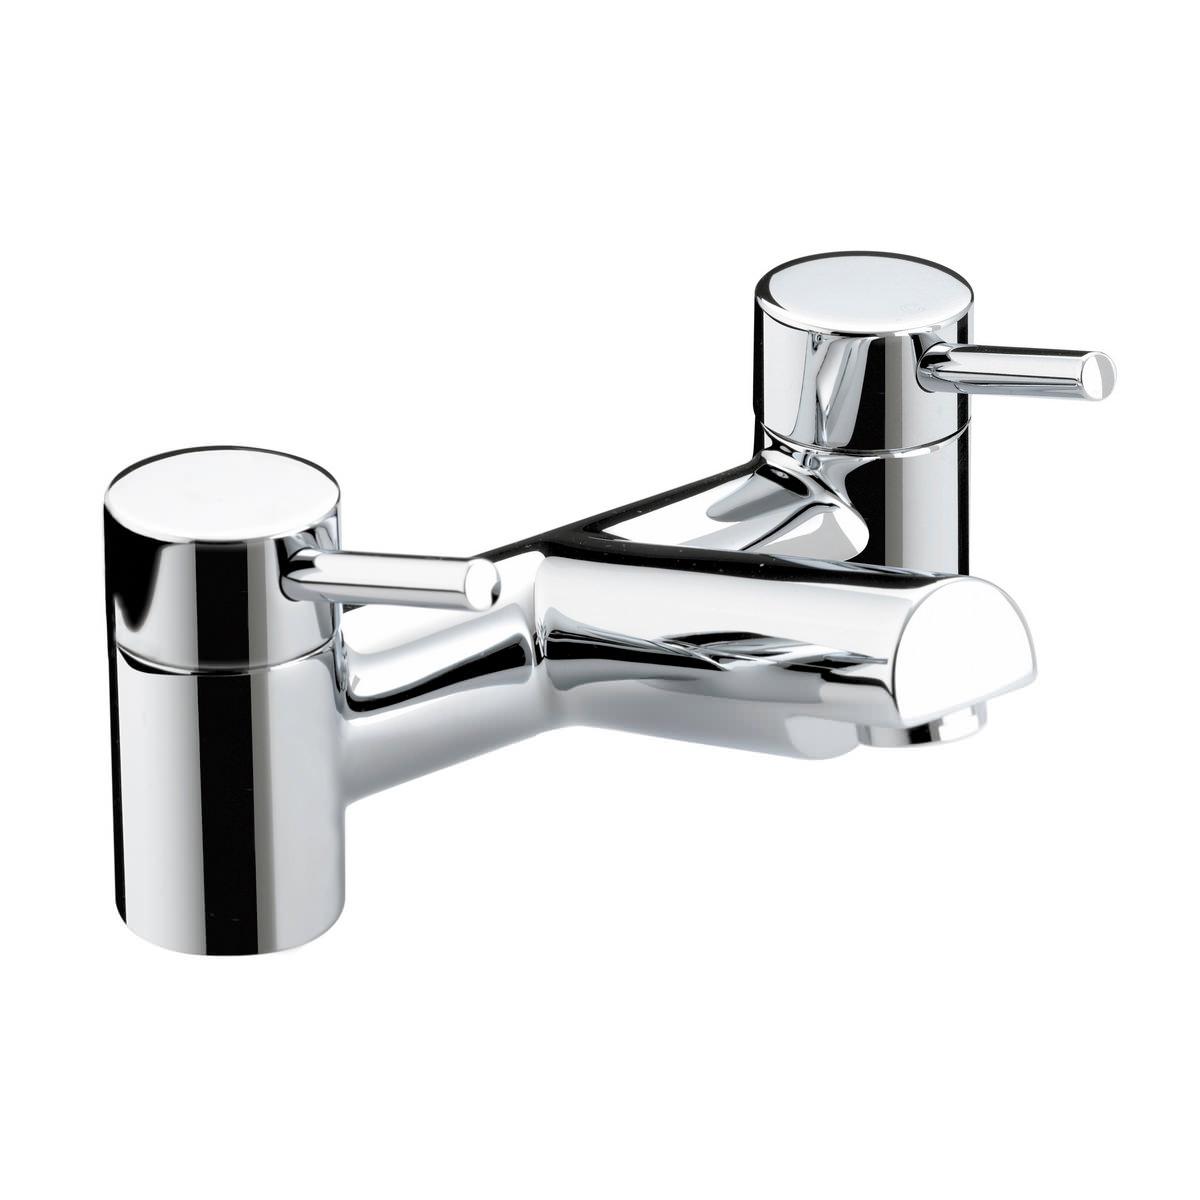 Bristan Prism Bath Filler Tap Chrome Pm Bf C